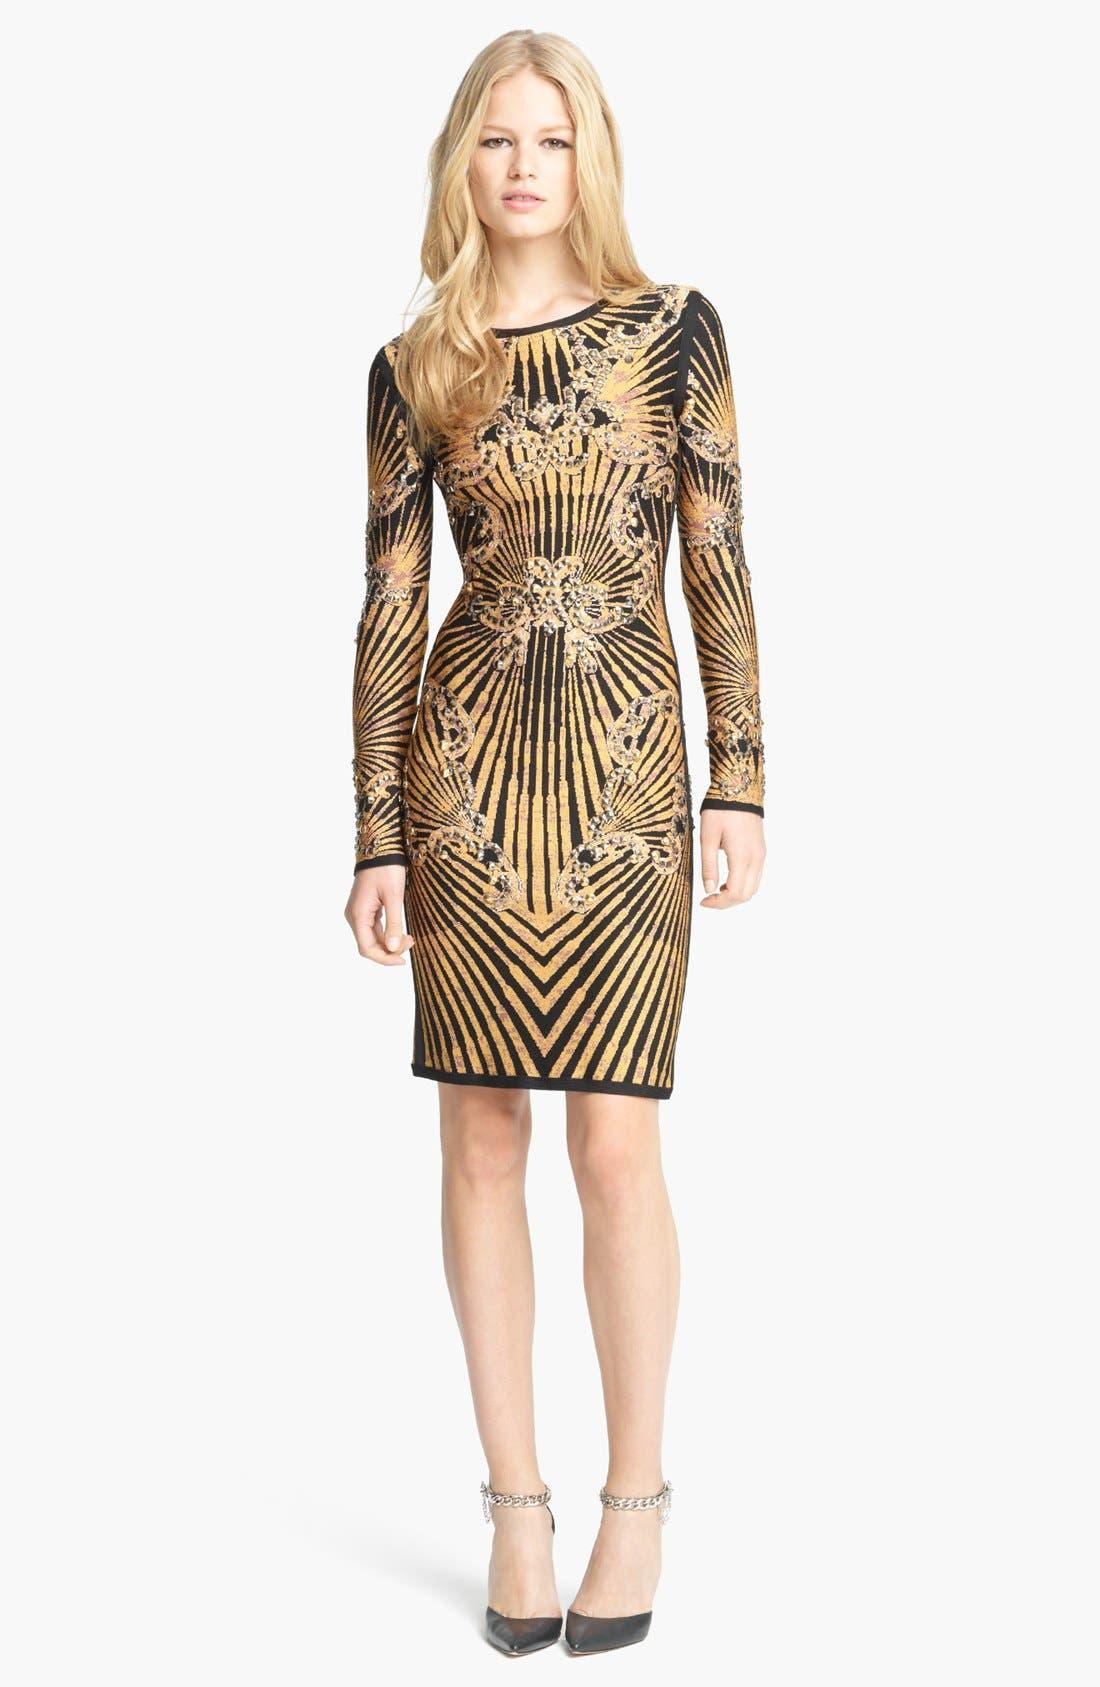 Main Image - Herve Leger Studded Knit Dress